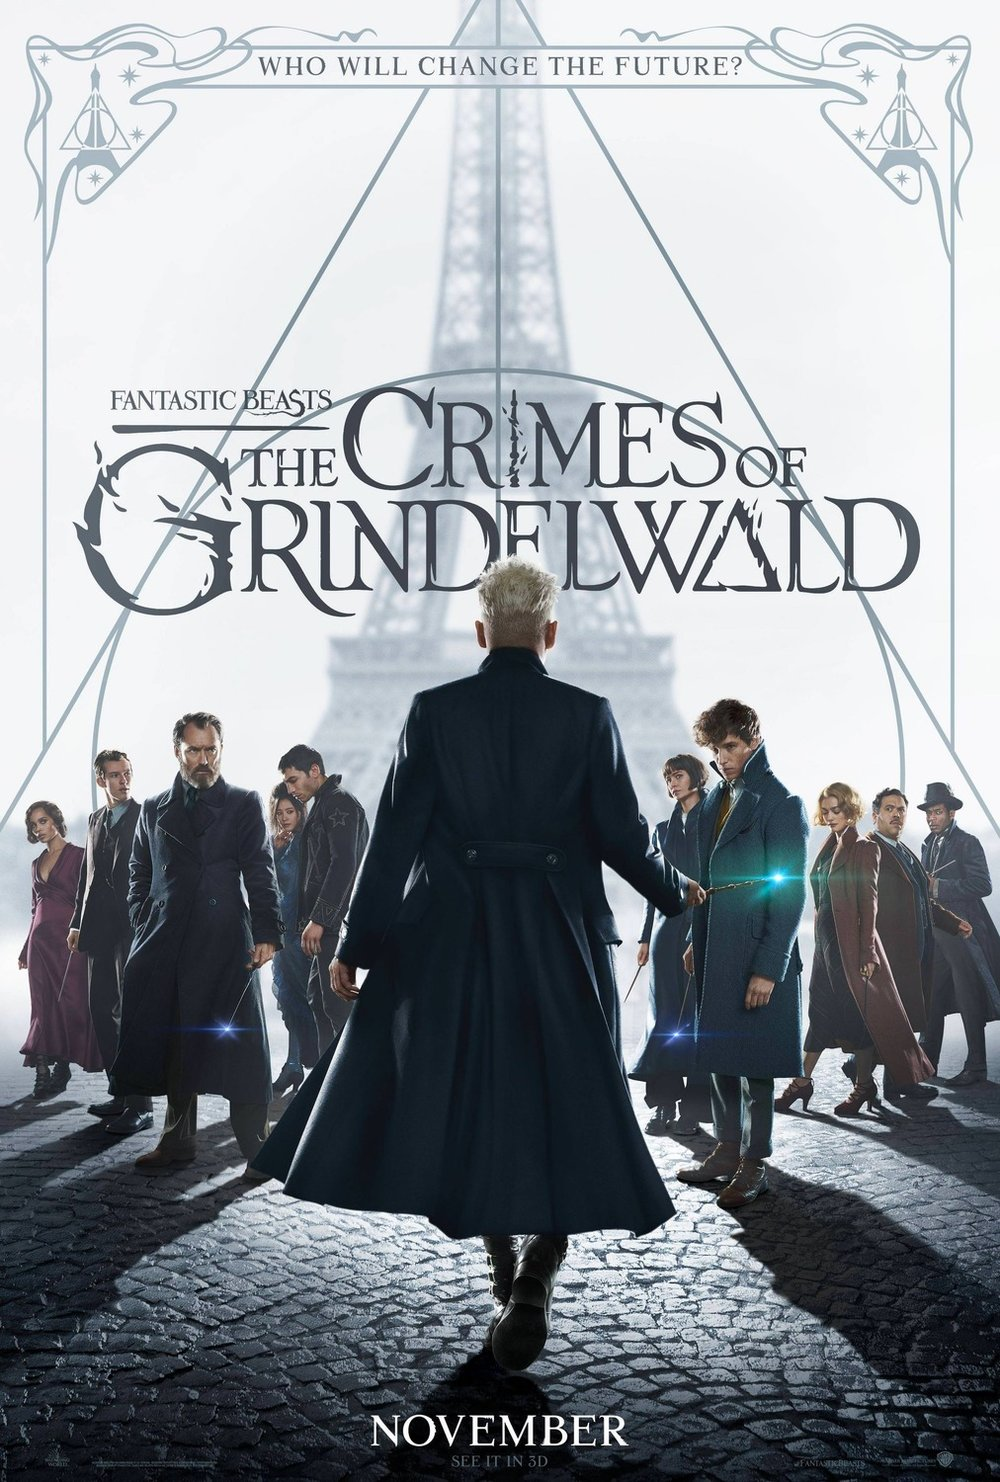 fantastic_beasts_the_crimes_of_grindelwald_ver14_xlg.jpg